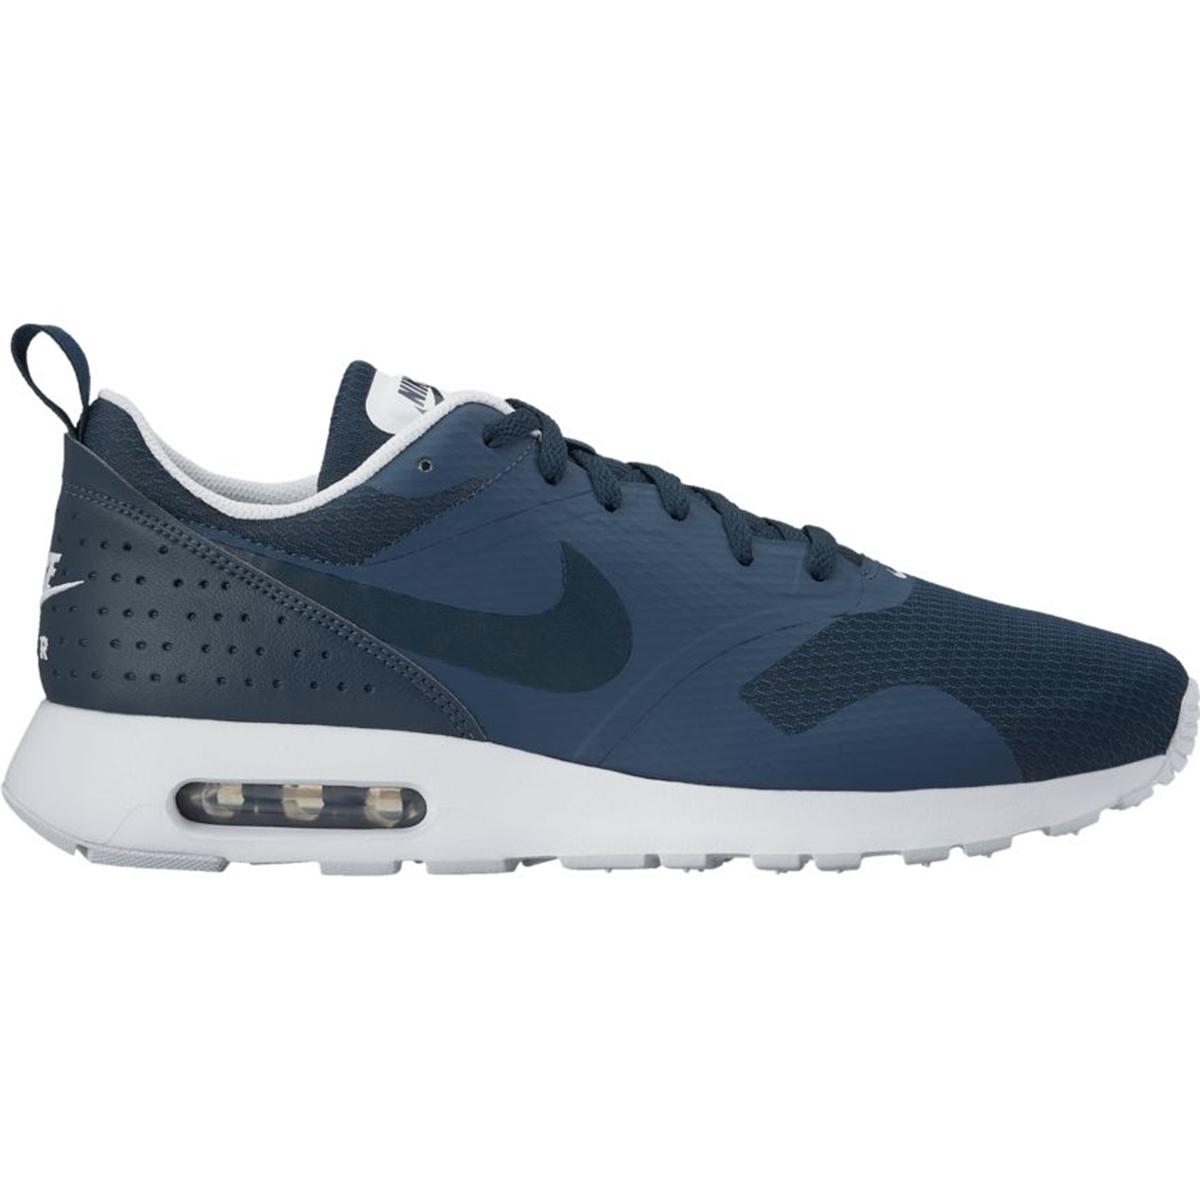 Nike M AIR MAX TAVAS armory navy- Nava Sport - Vi selger klær og sko ... 611c12a042df